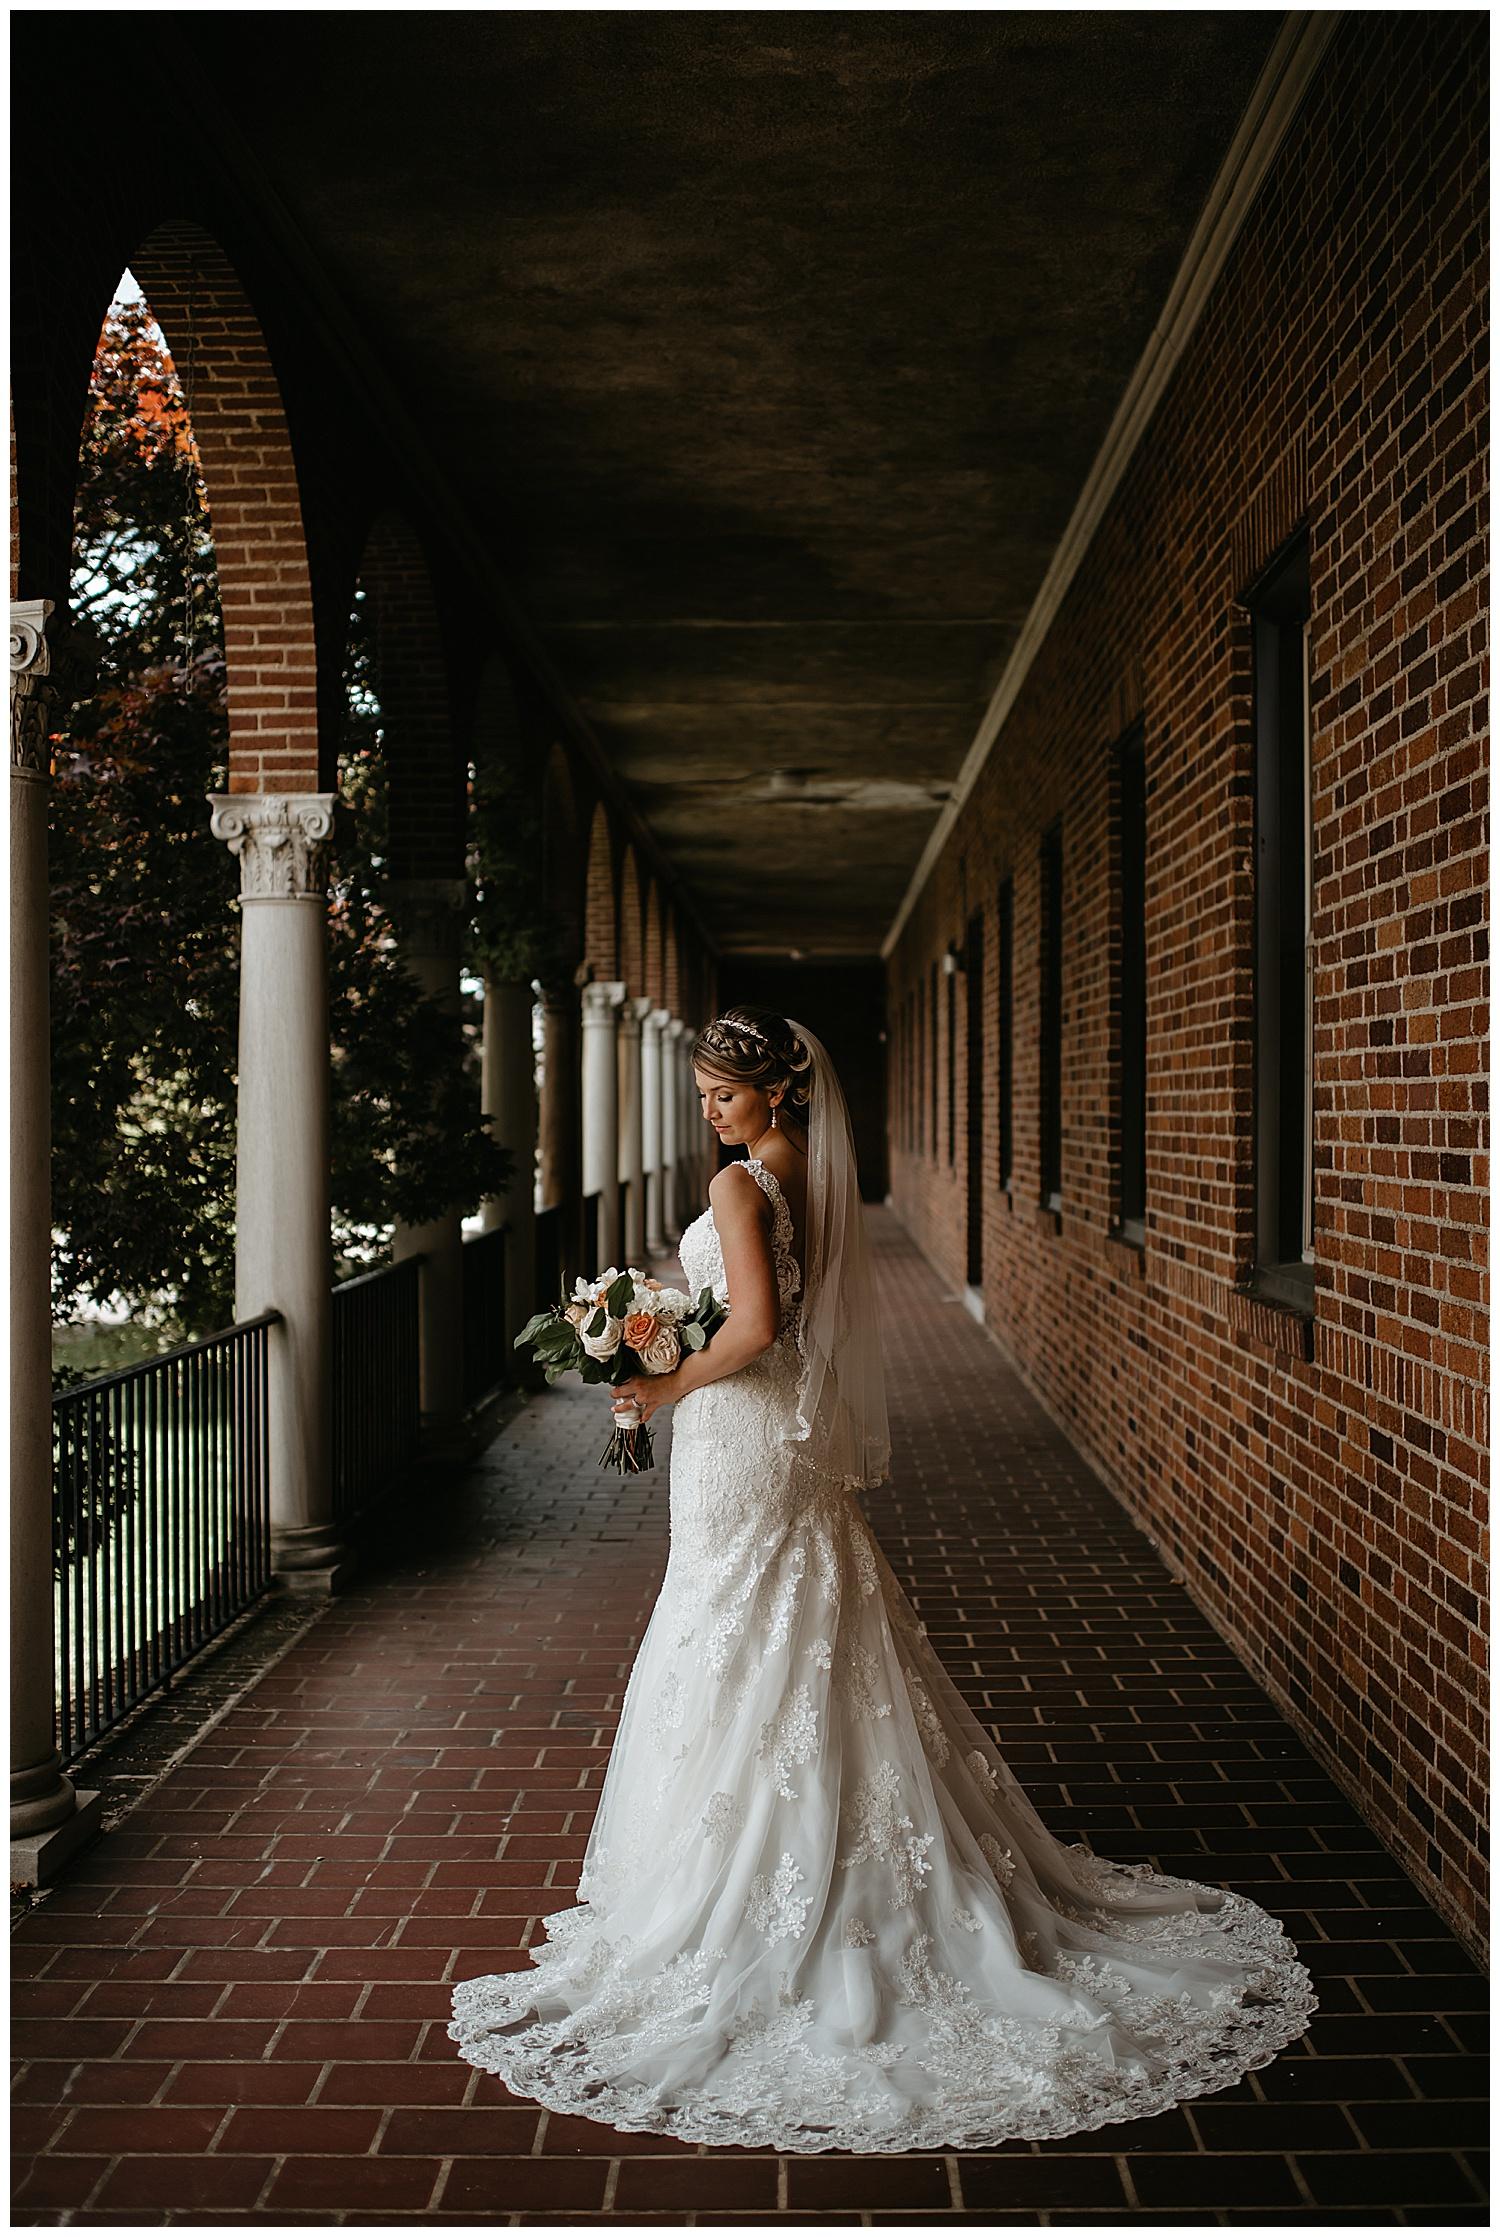 NEPA-Lehigh-Valley-Wedding-Photographer-at-Fountain-Springs-Country-Inn-Ashland-PA_0047.jpg